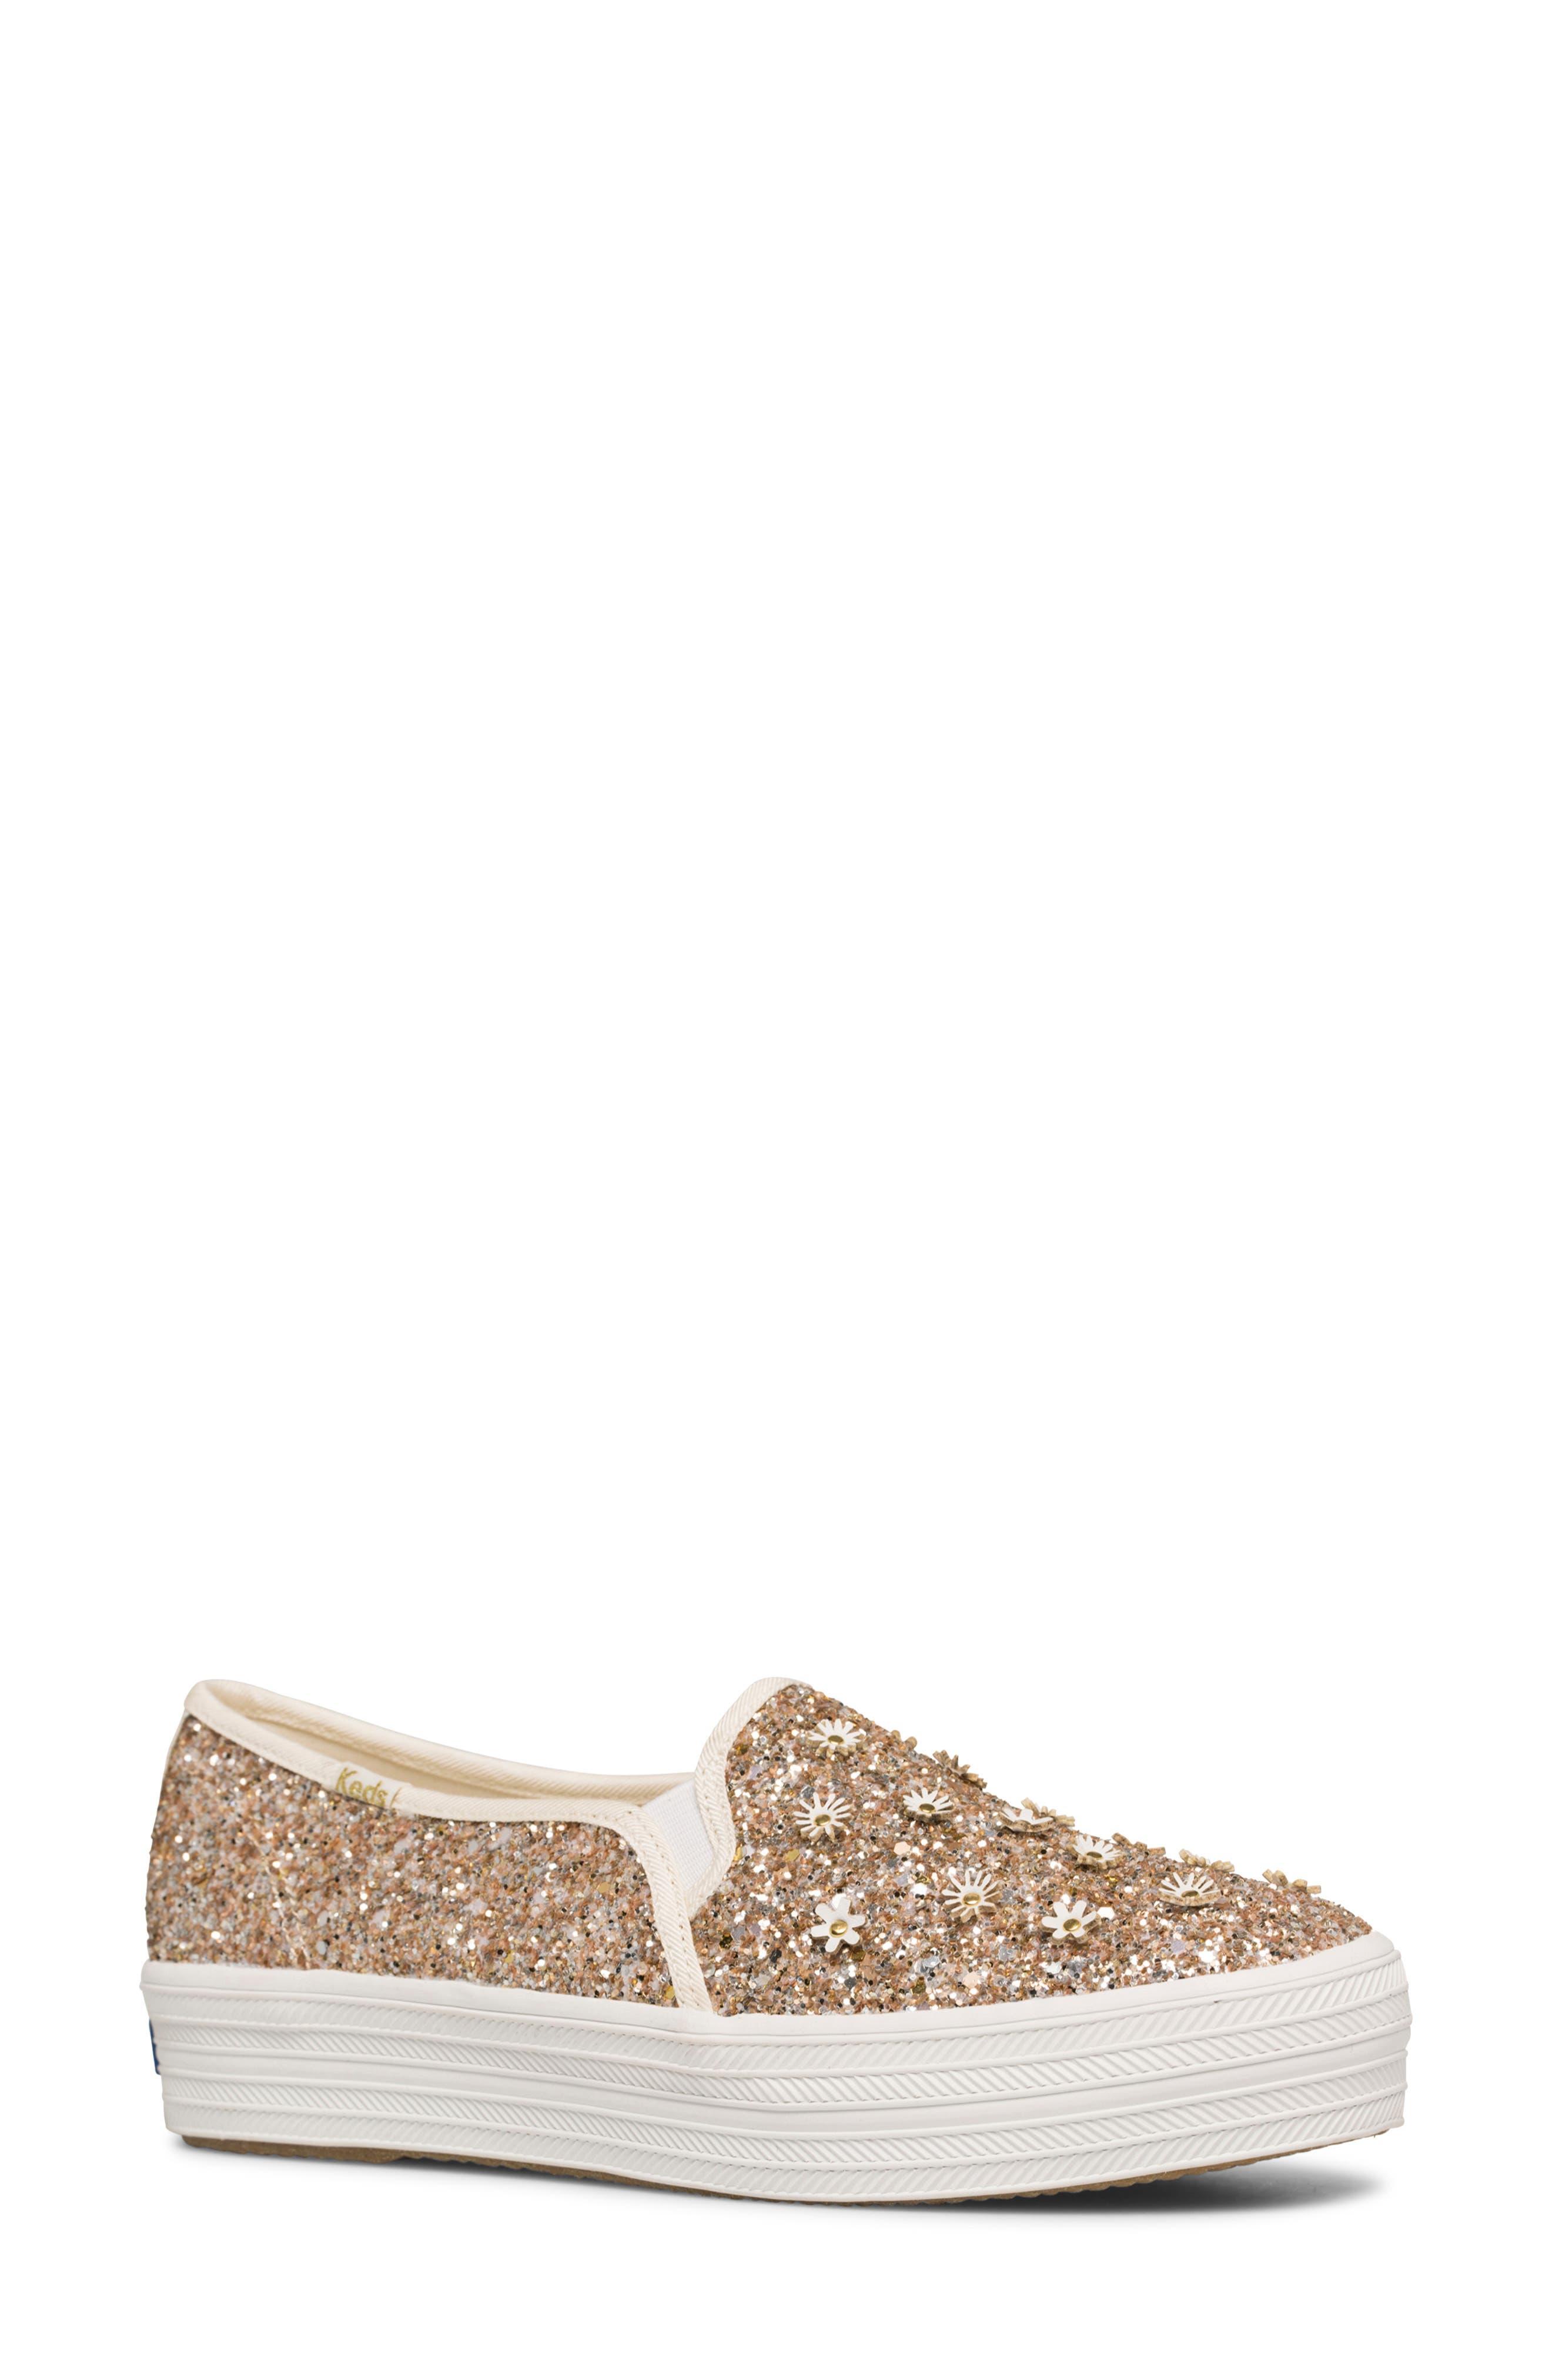 Women's Keds X Kate Spade New York Triple Decker Glitter Slip-On Sneaker